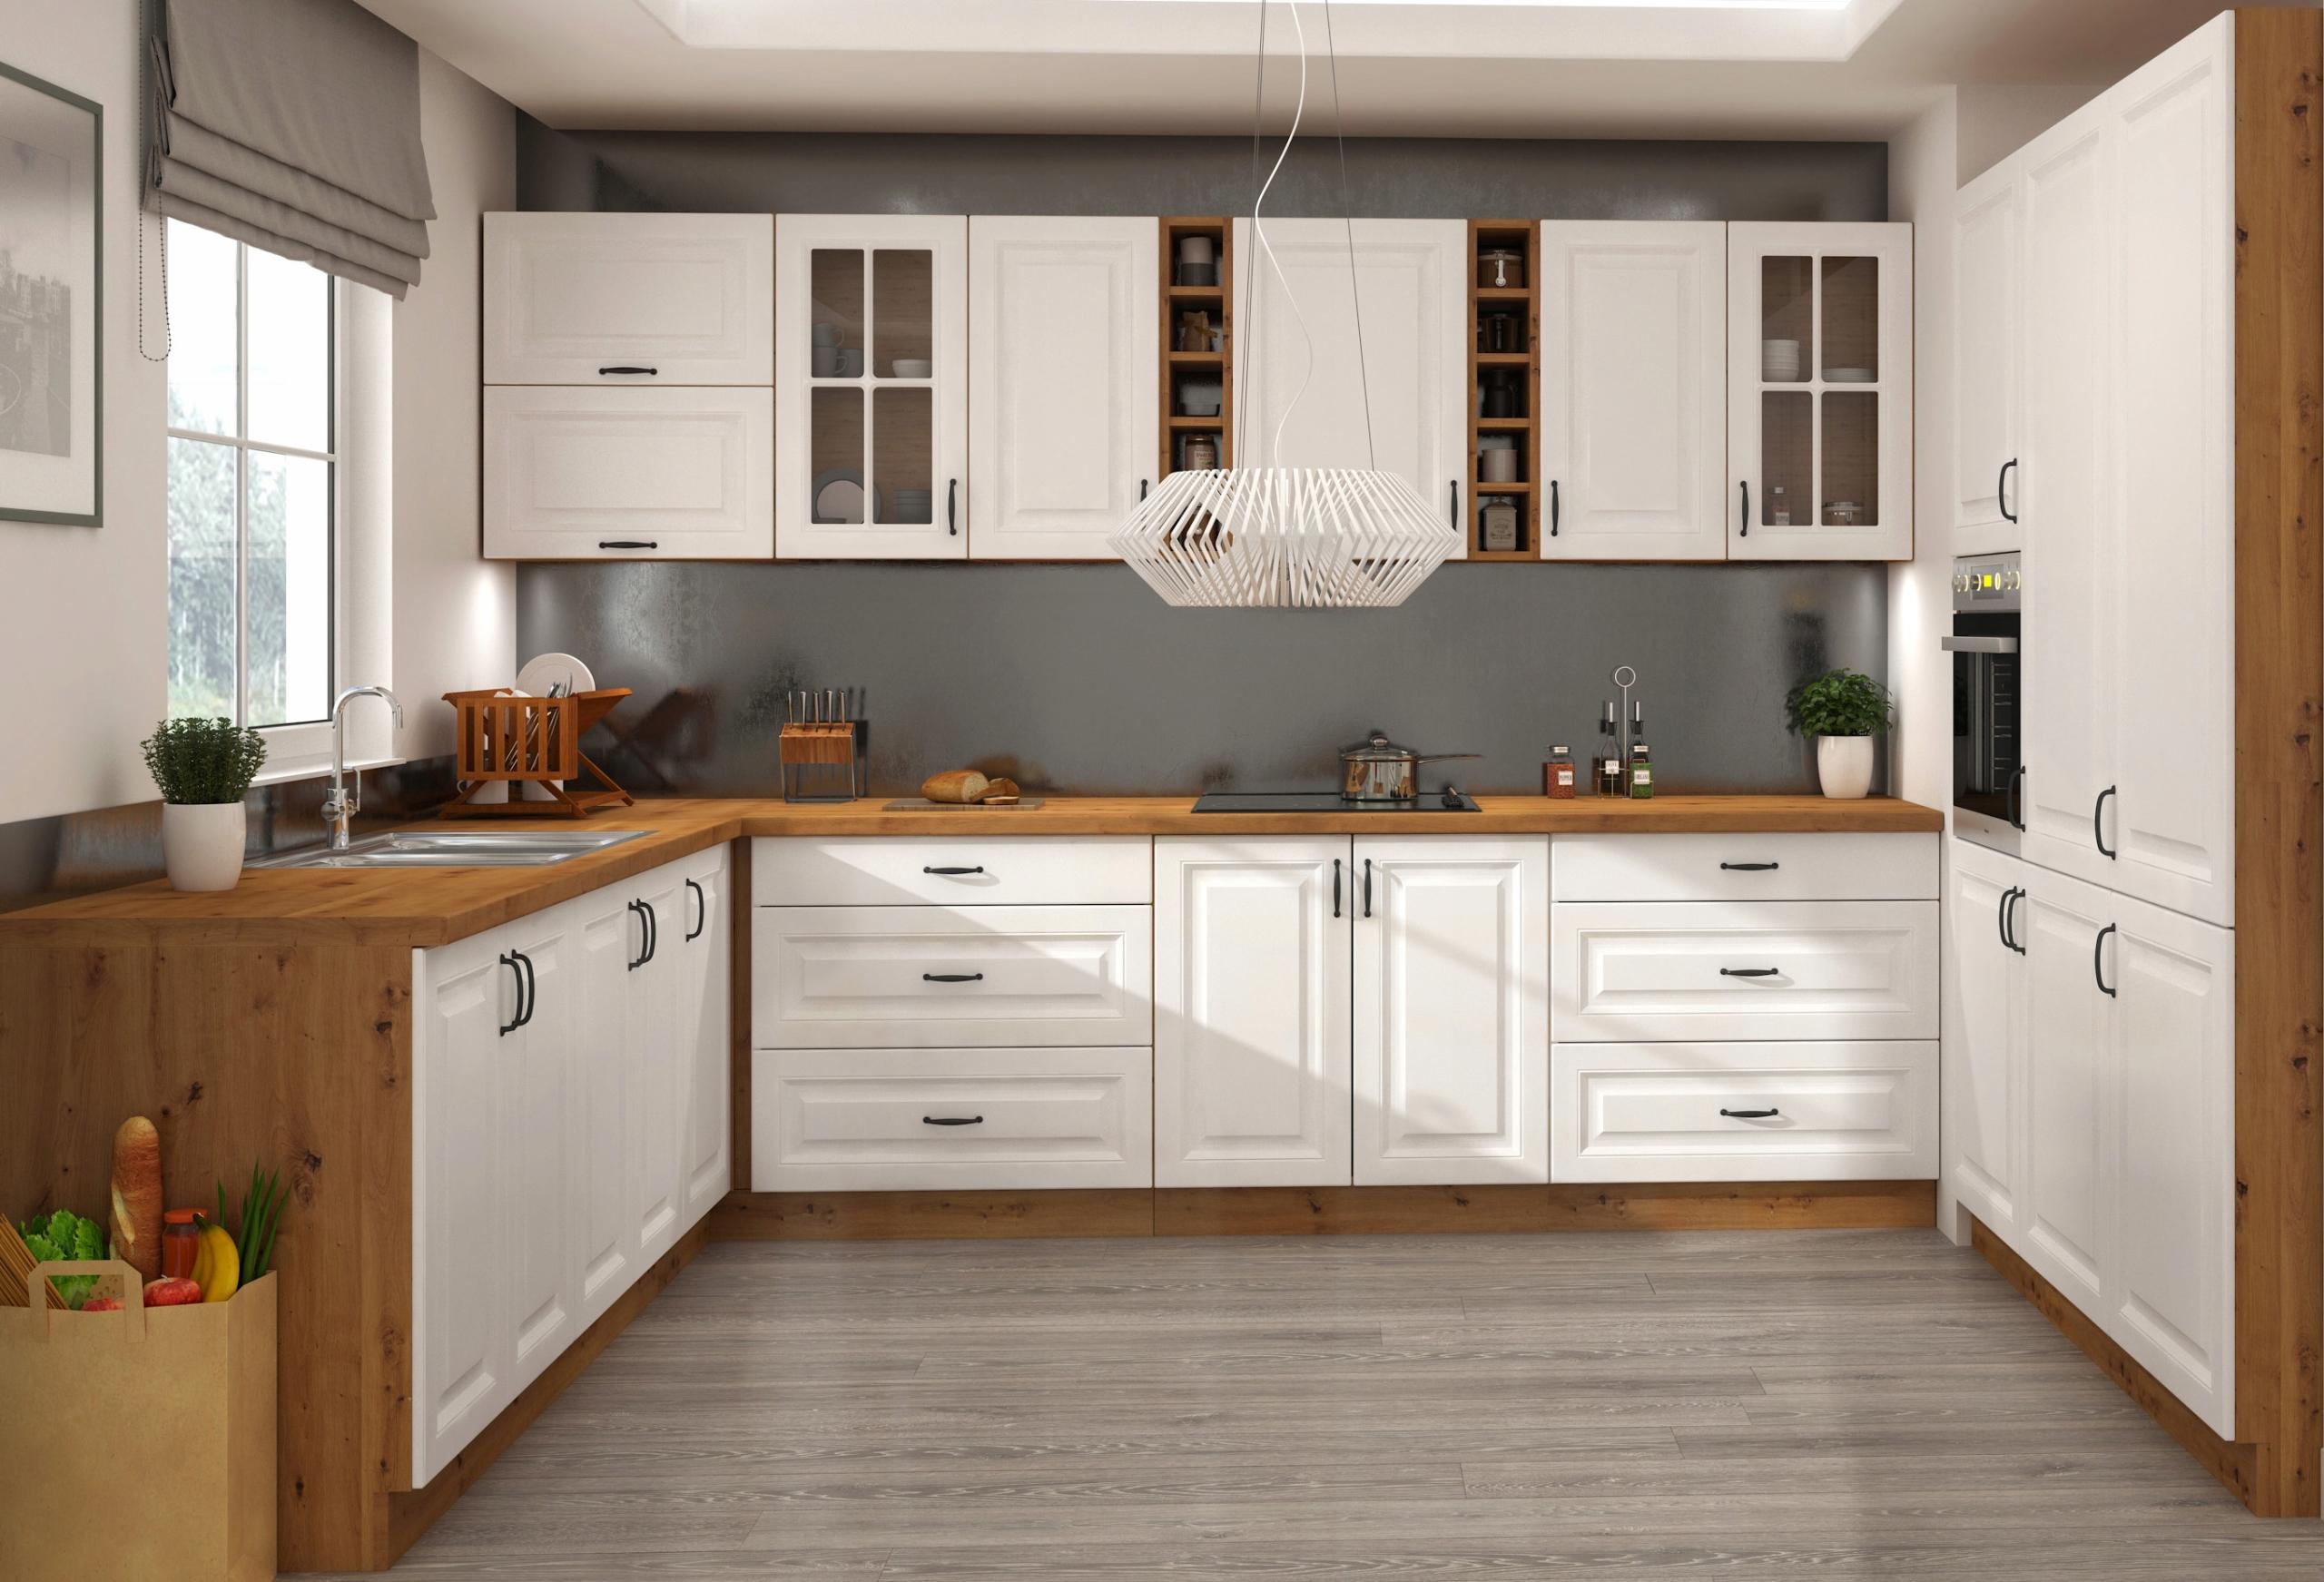 Zestaw mebli kuchennych szafki szuflady Style I